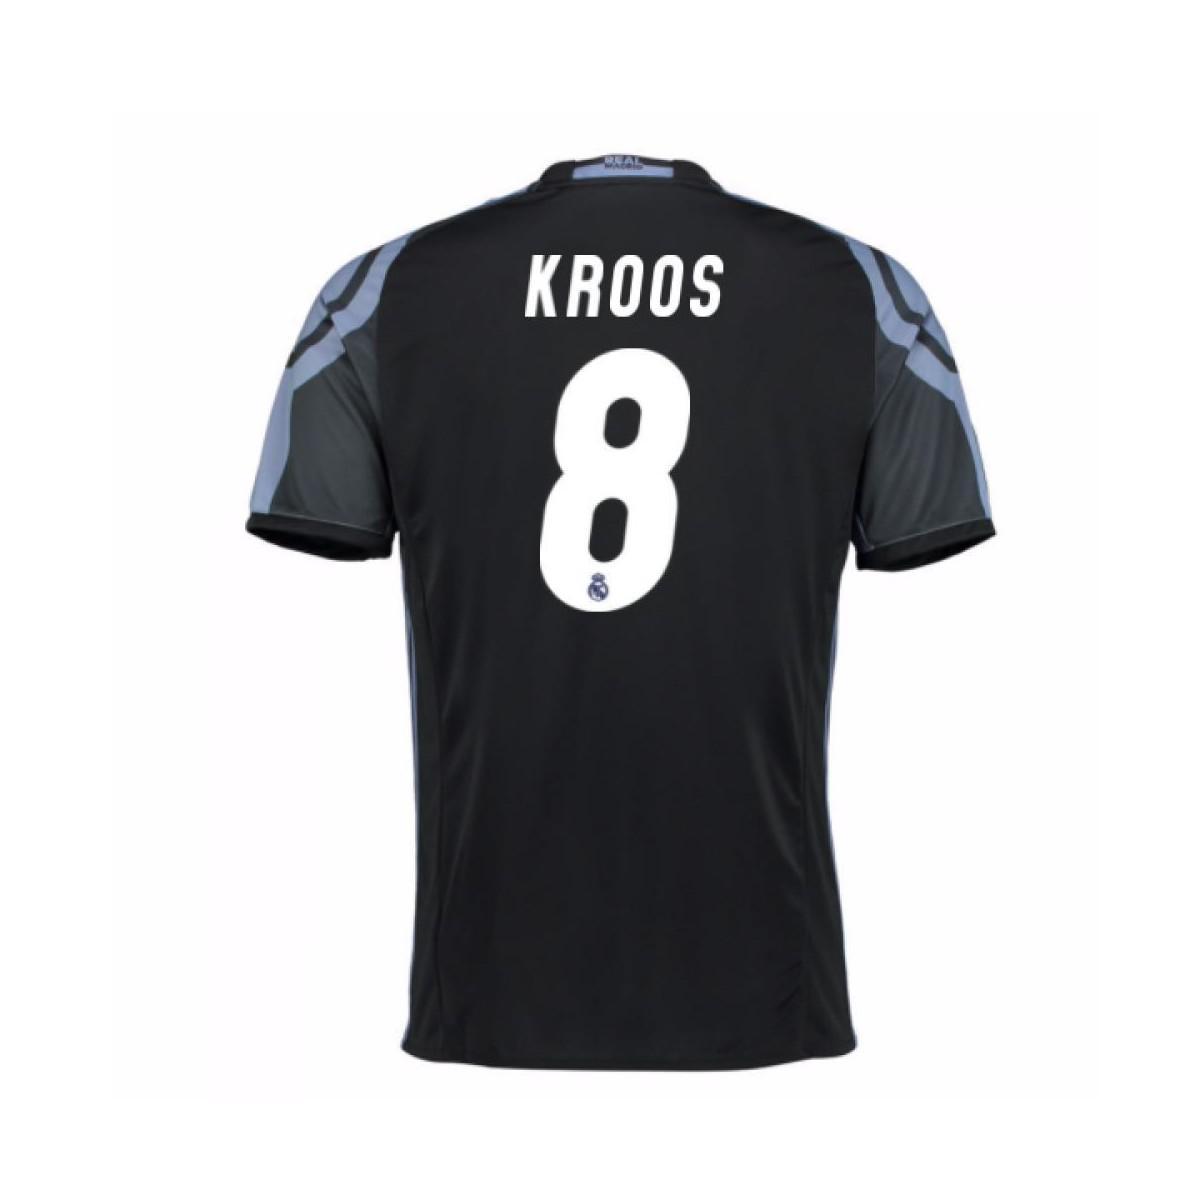 137729dd9 Adidas - 2016-17 Real Madrid 3rd Shirt (kroos 8) - Kids Women s. View  fullscreen